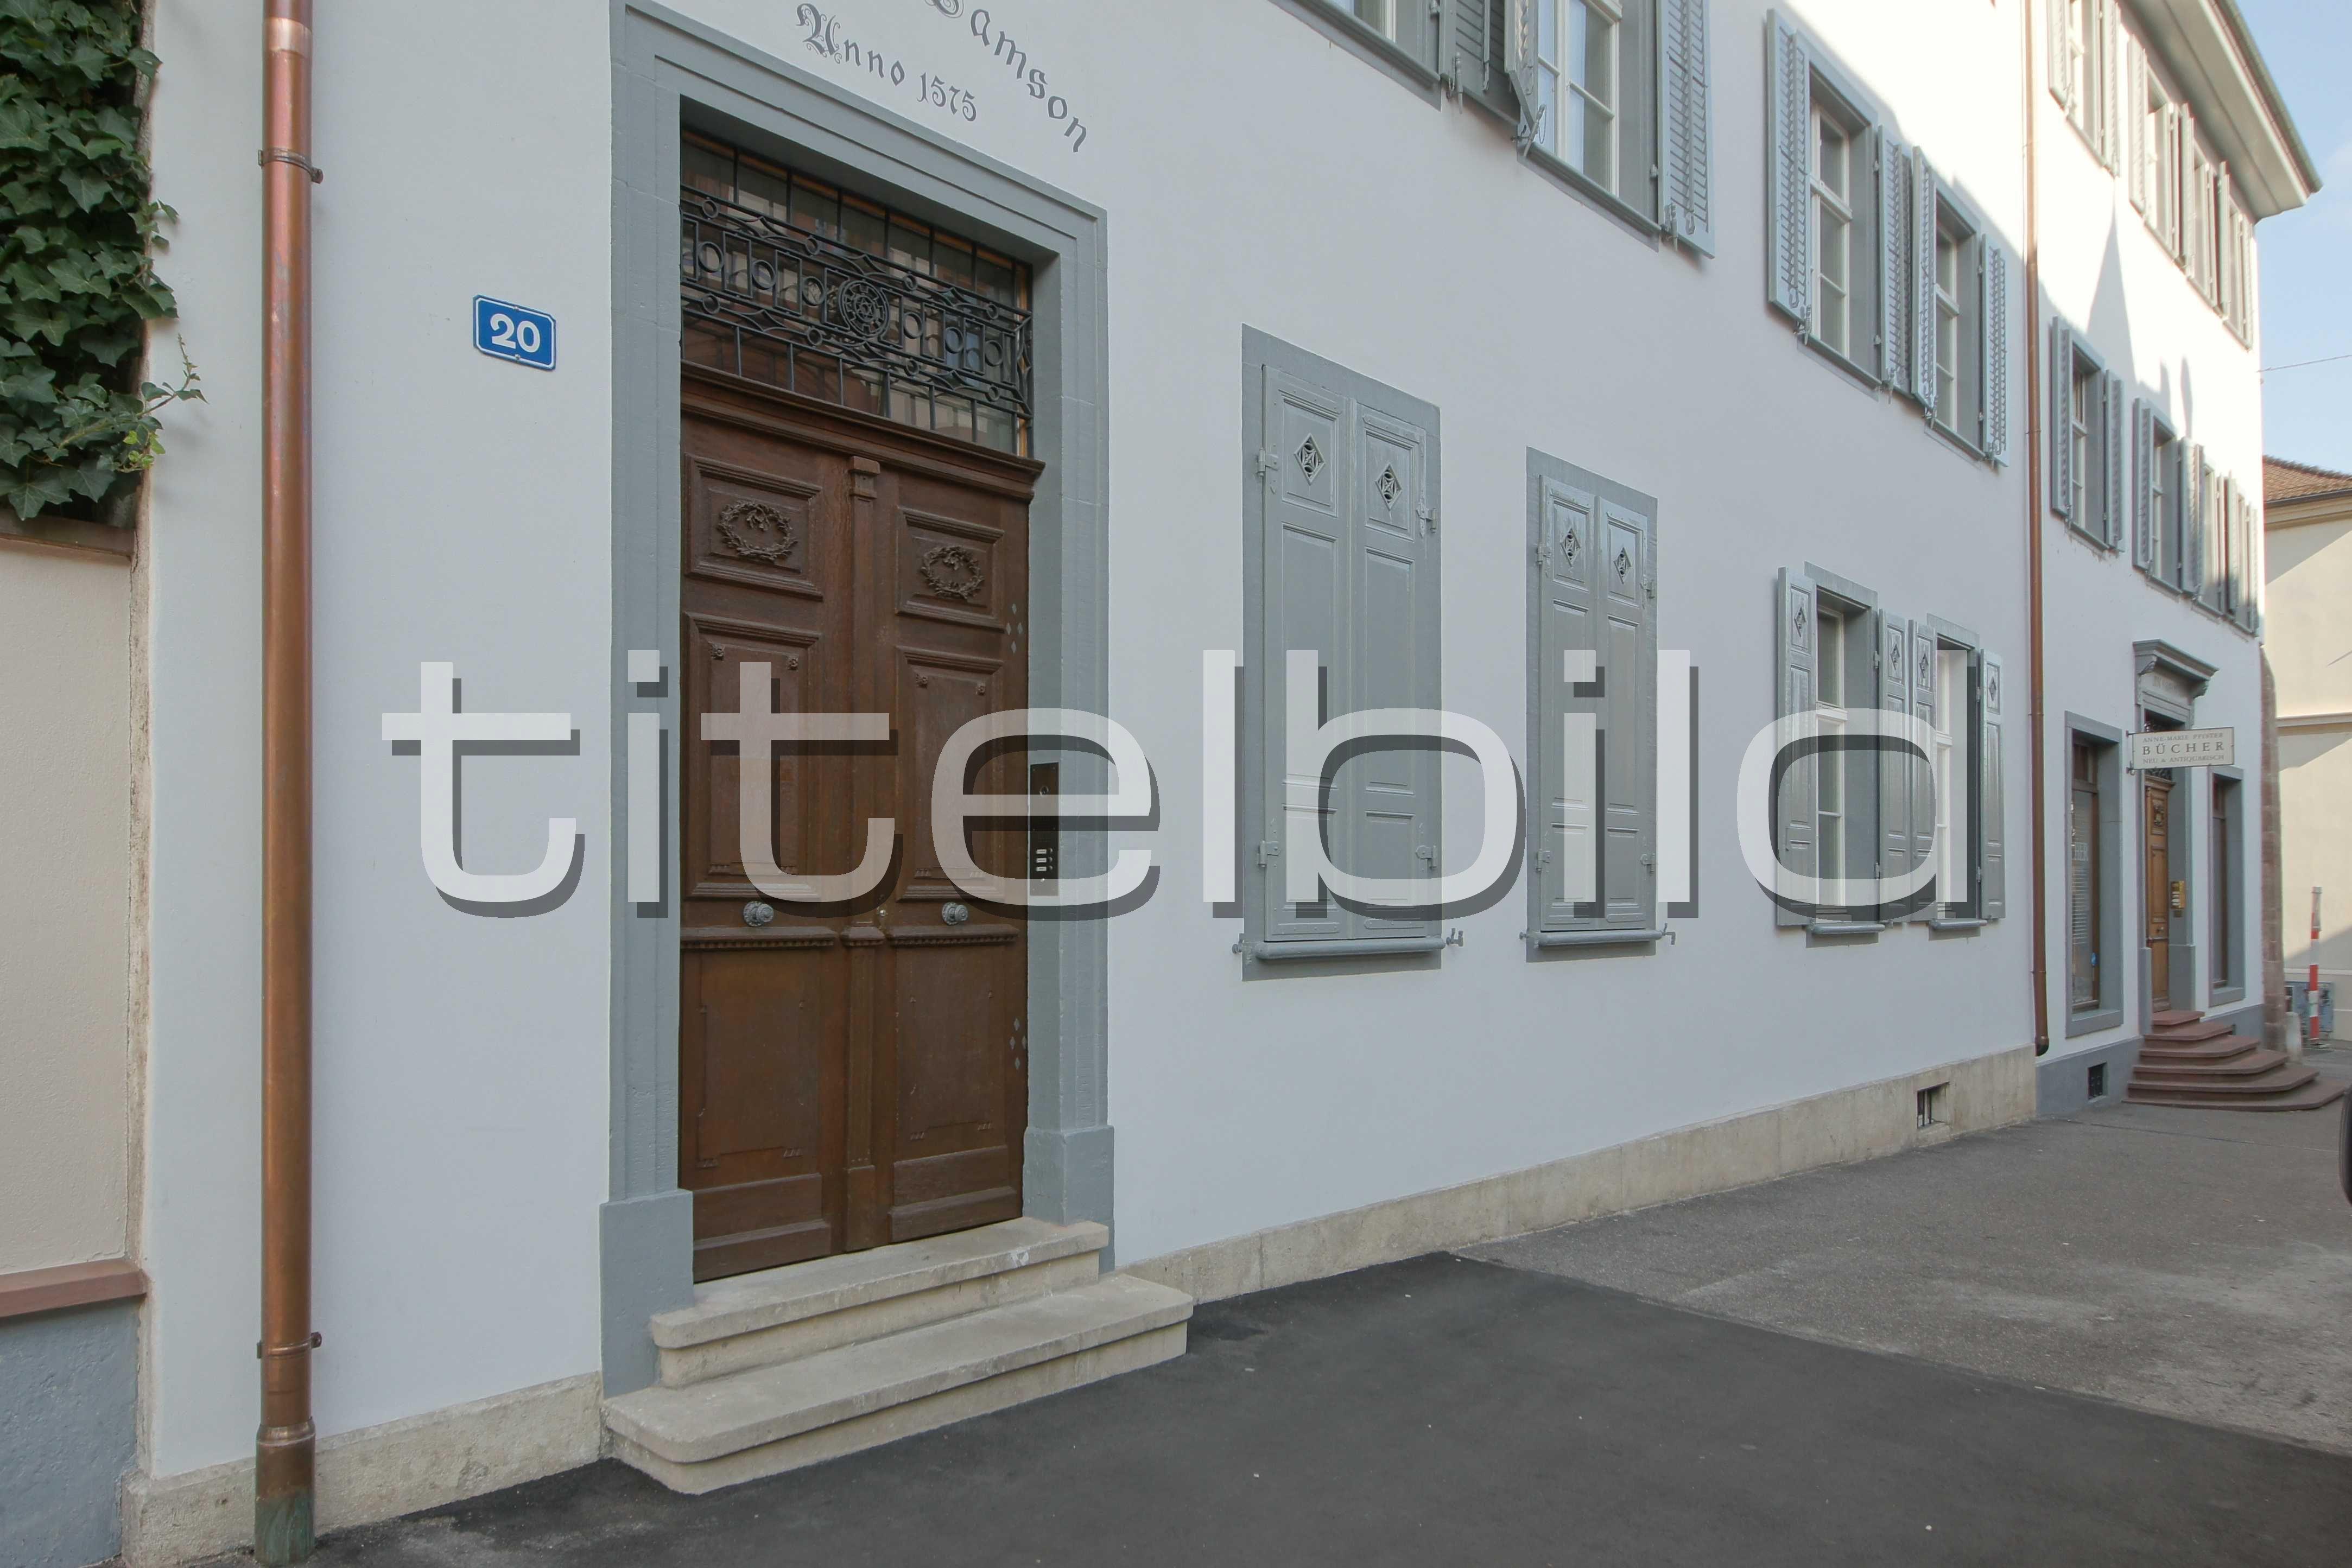 Objektbilder: Haus zum oberen Samson, Basel